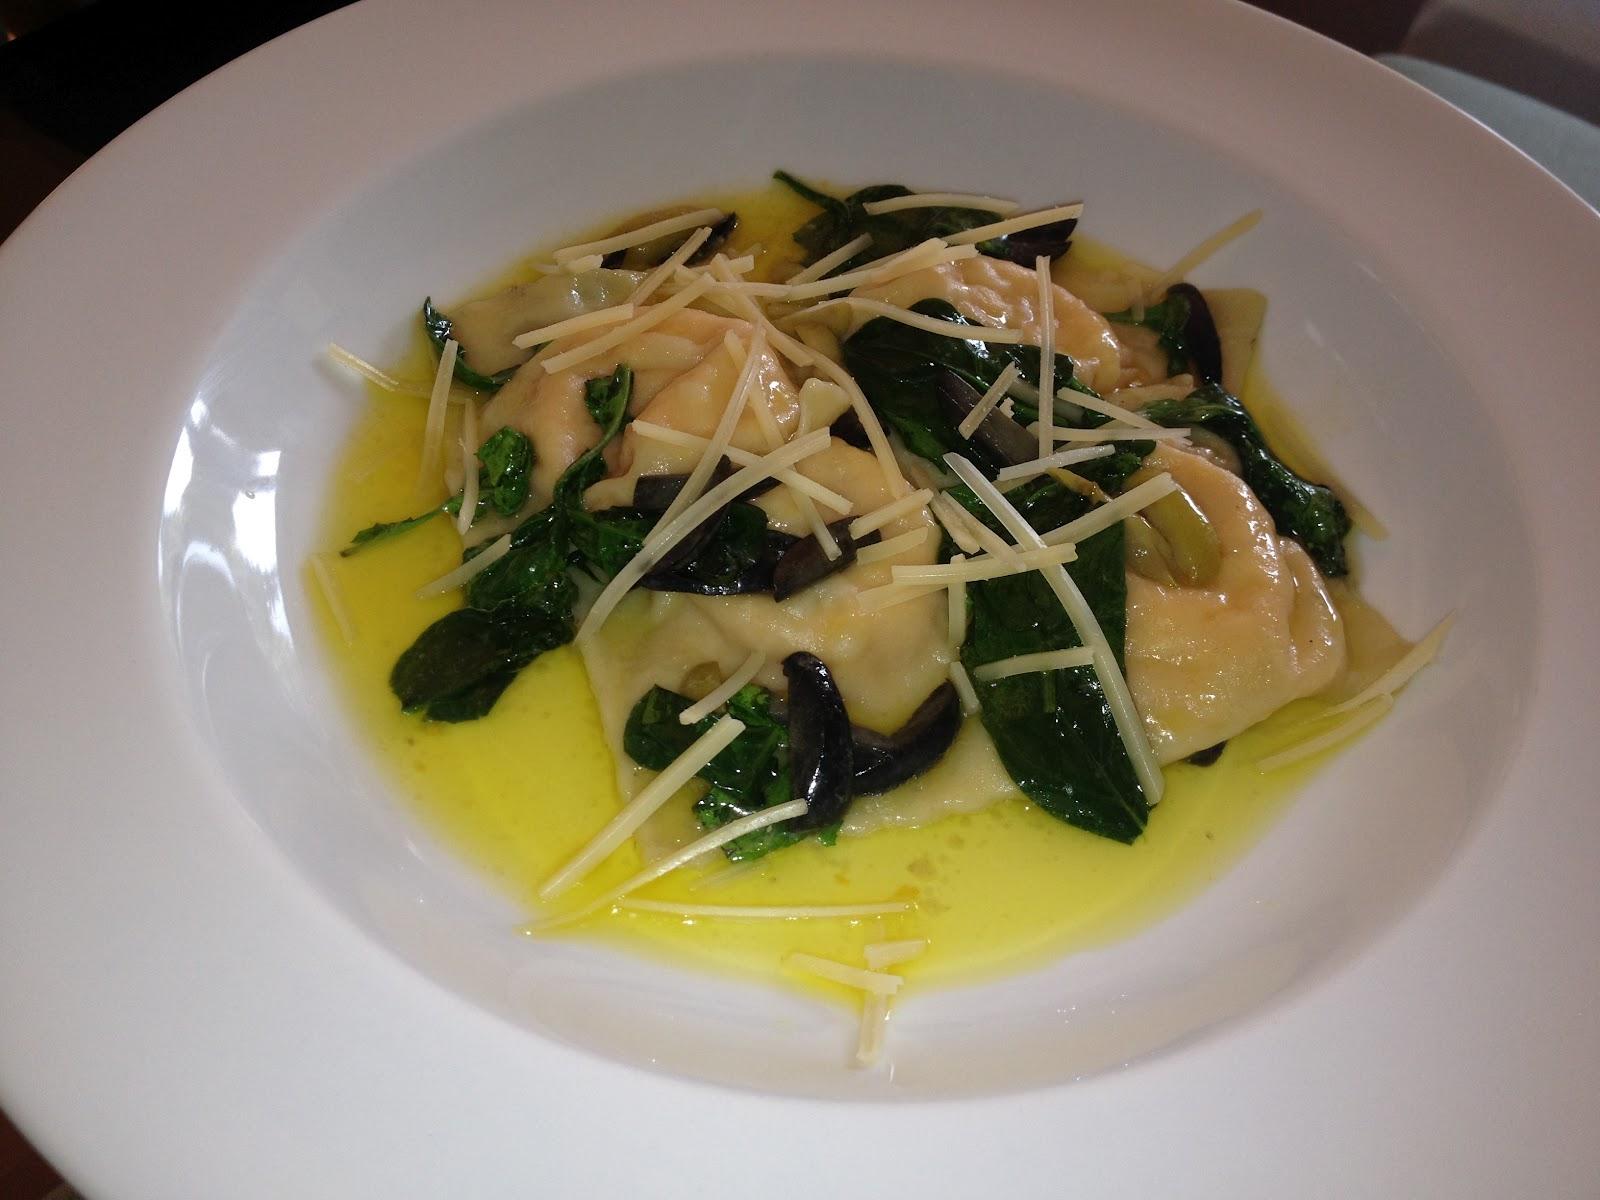 Ravioles rellenos de zapallo y ricota en salsa de - Salsa para verduras al horno ...